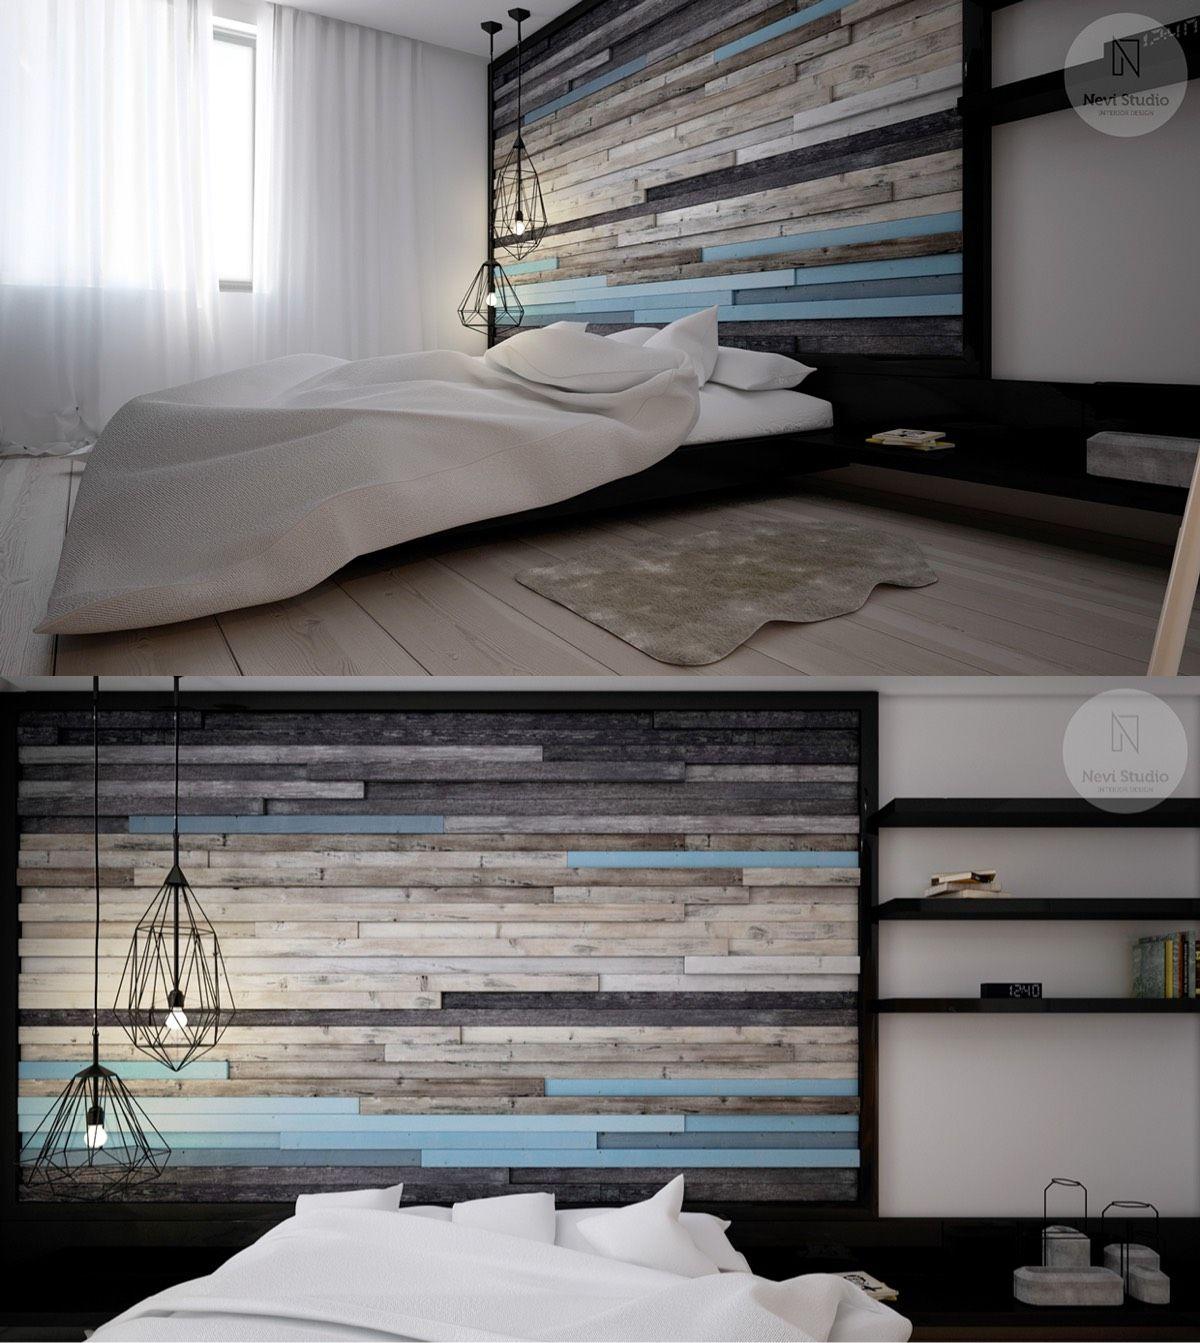 21+ Modern bedroom art ideas formasi cpns